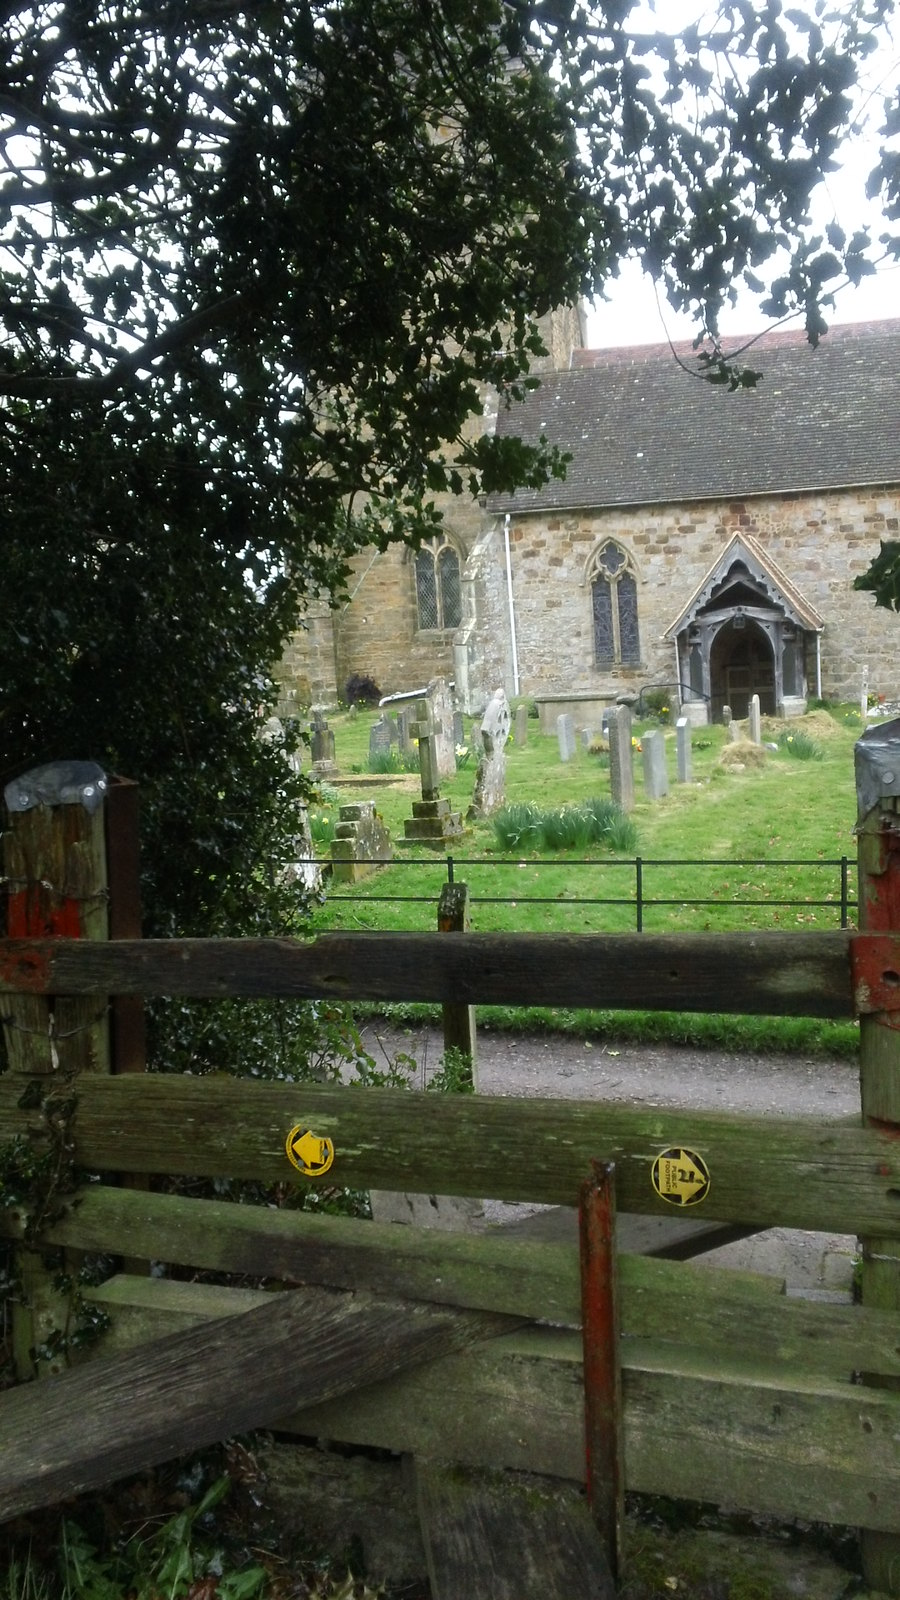 Church of St. Mary The Virgin, Hartfield, Kent